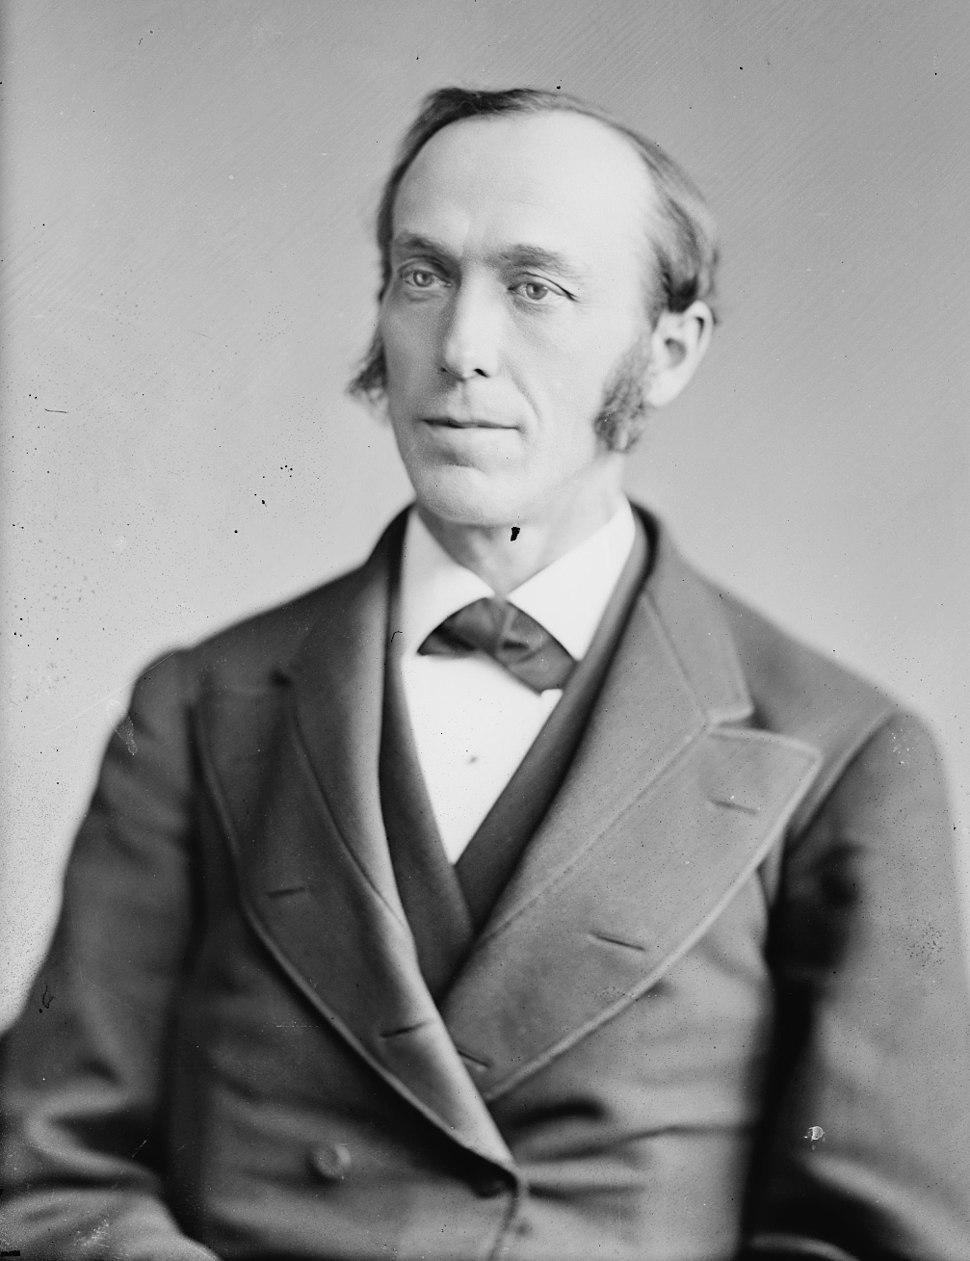 Thomas C. Platt - Brady-Handy